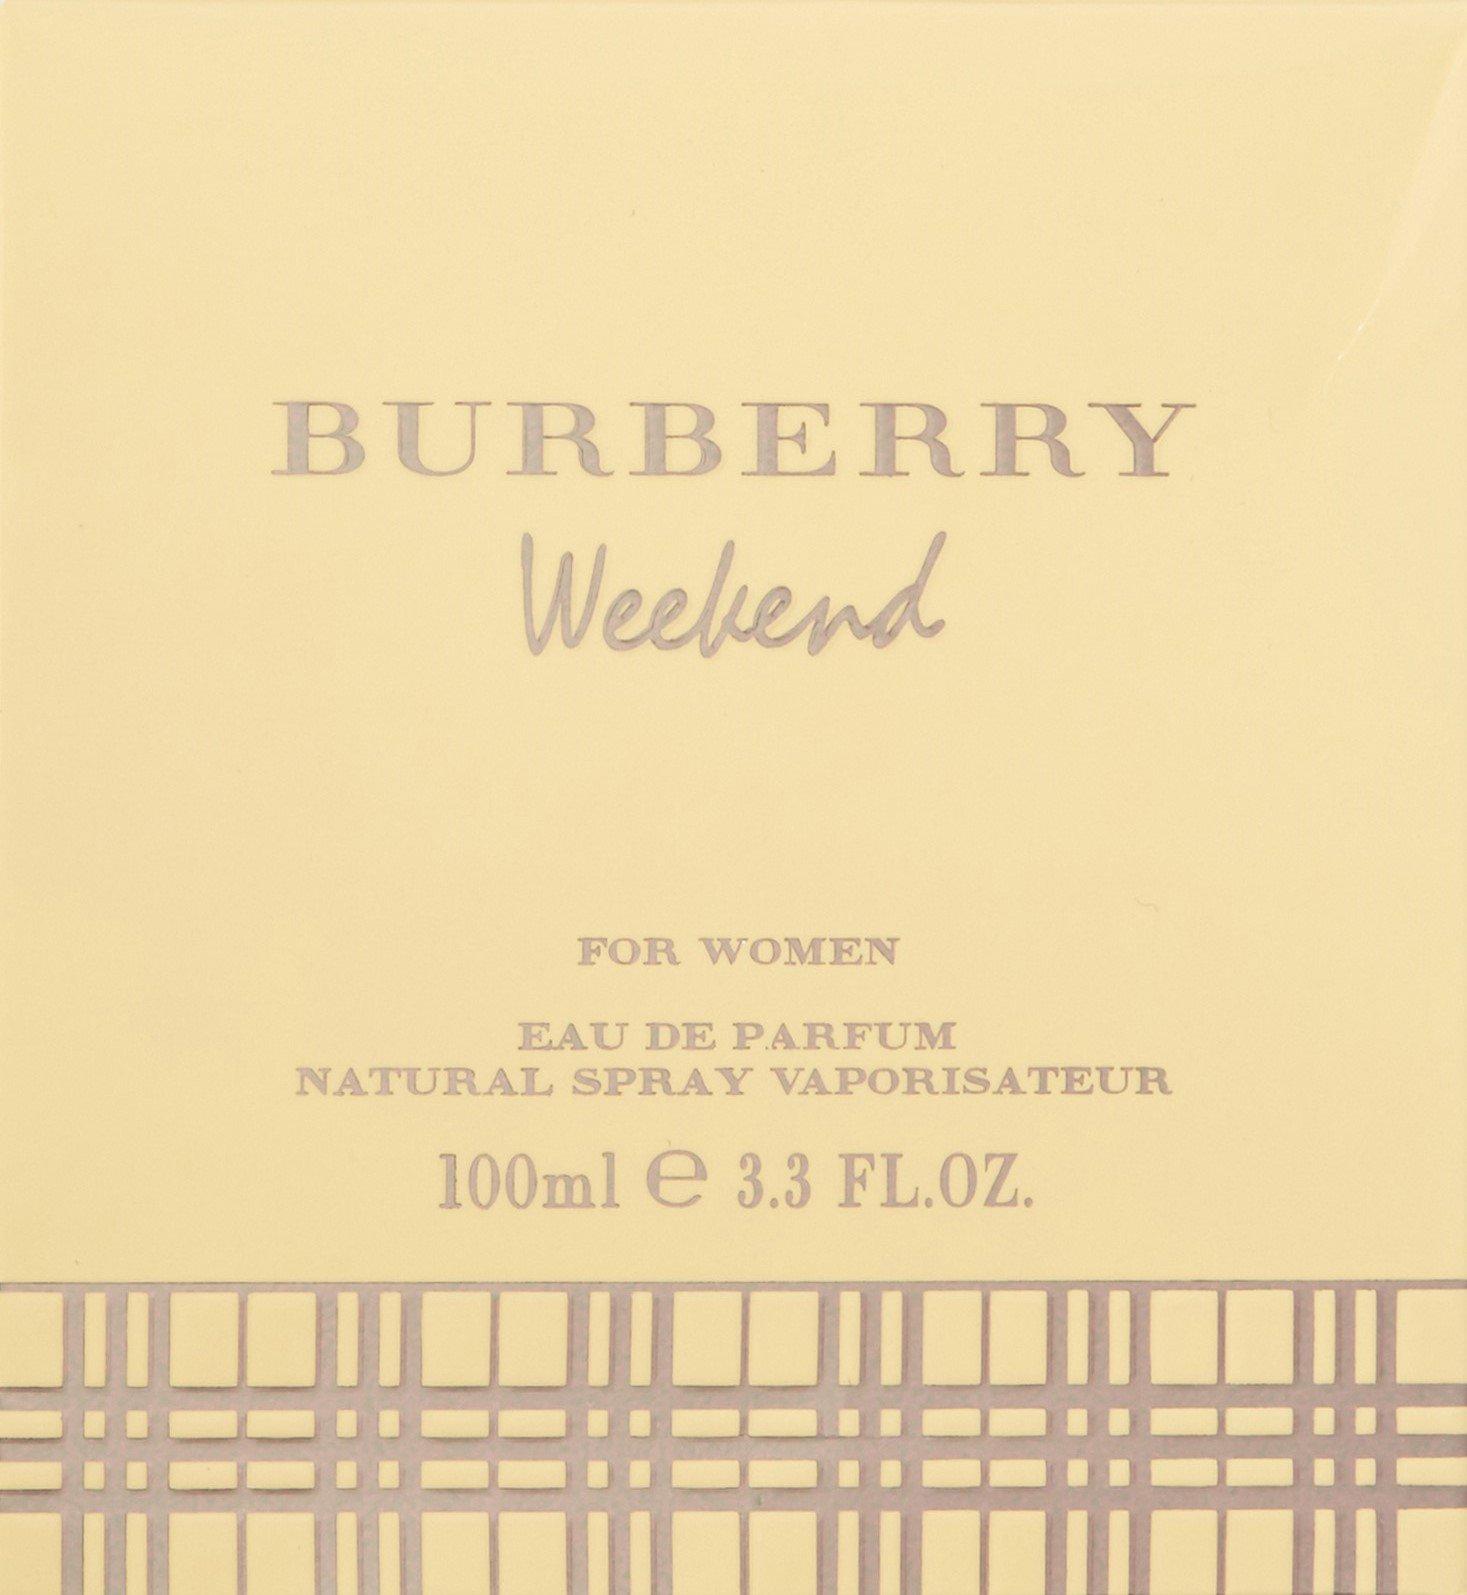 BURBERRY-Weekend-Eau-De-Parfum-for-Women-34-Fl-oz